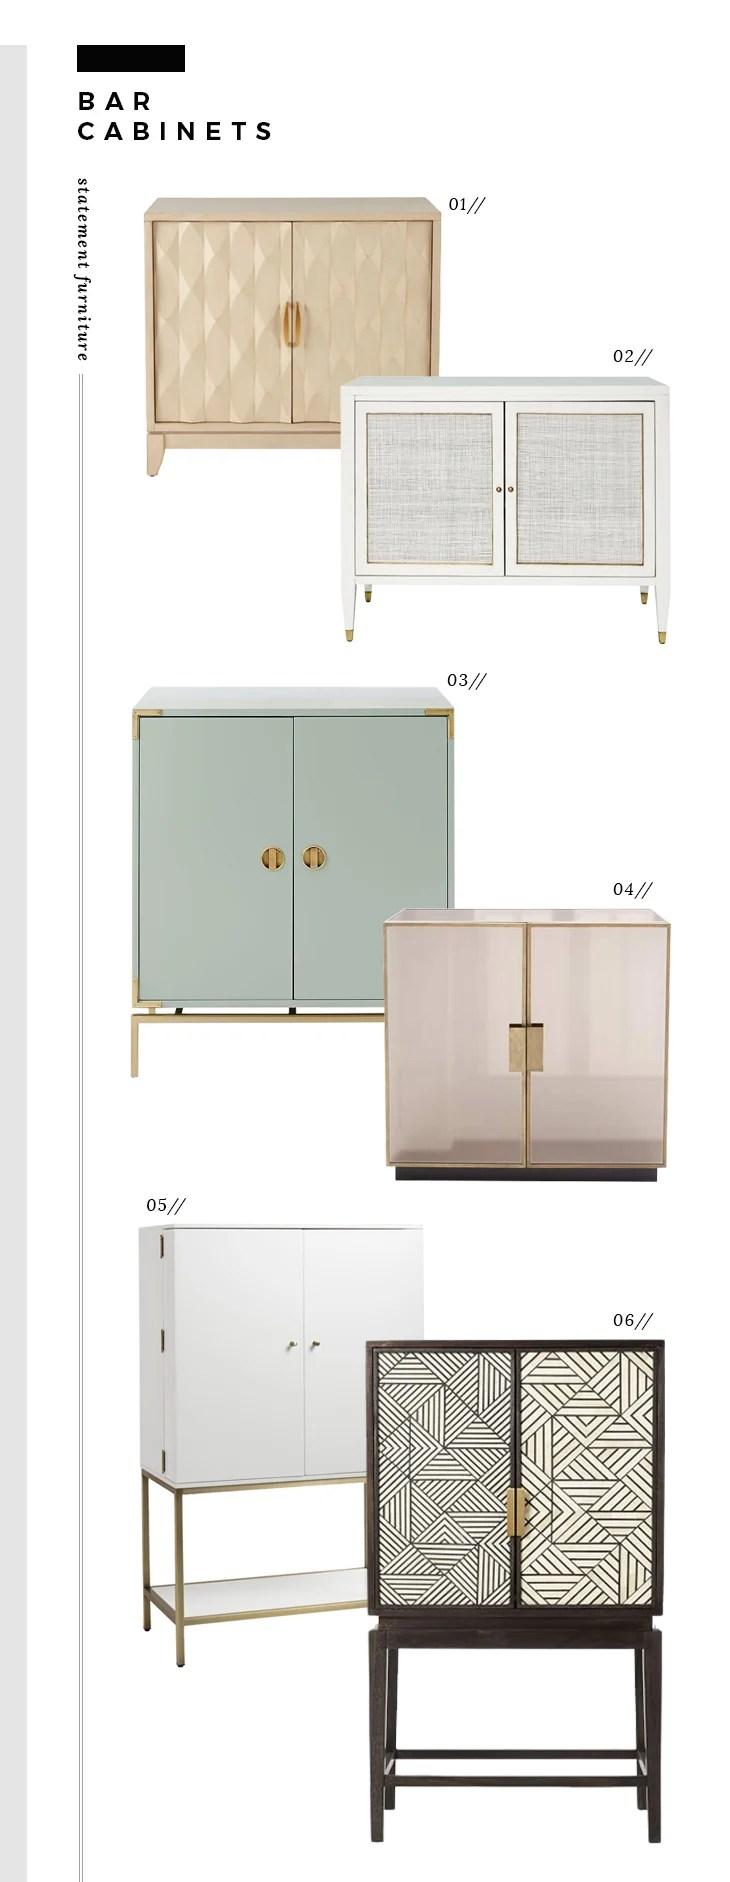 Superbe 01: Gretchen Bar Cabinet // 02: Chic Bar Cabinet // 03: Aqua Bar Cabinet //  04: Mirrored Bar Cabinet // 05: White Lacquer Bar Cabinet // 06: Bone  Inlaid ...